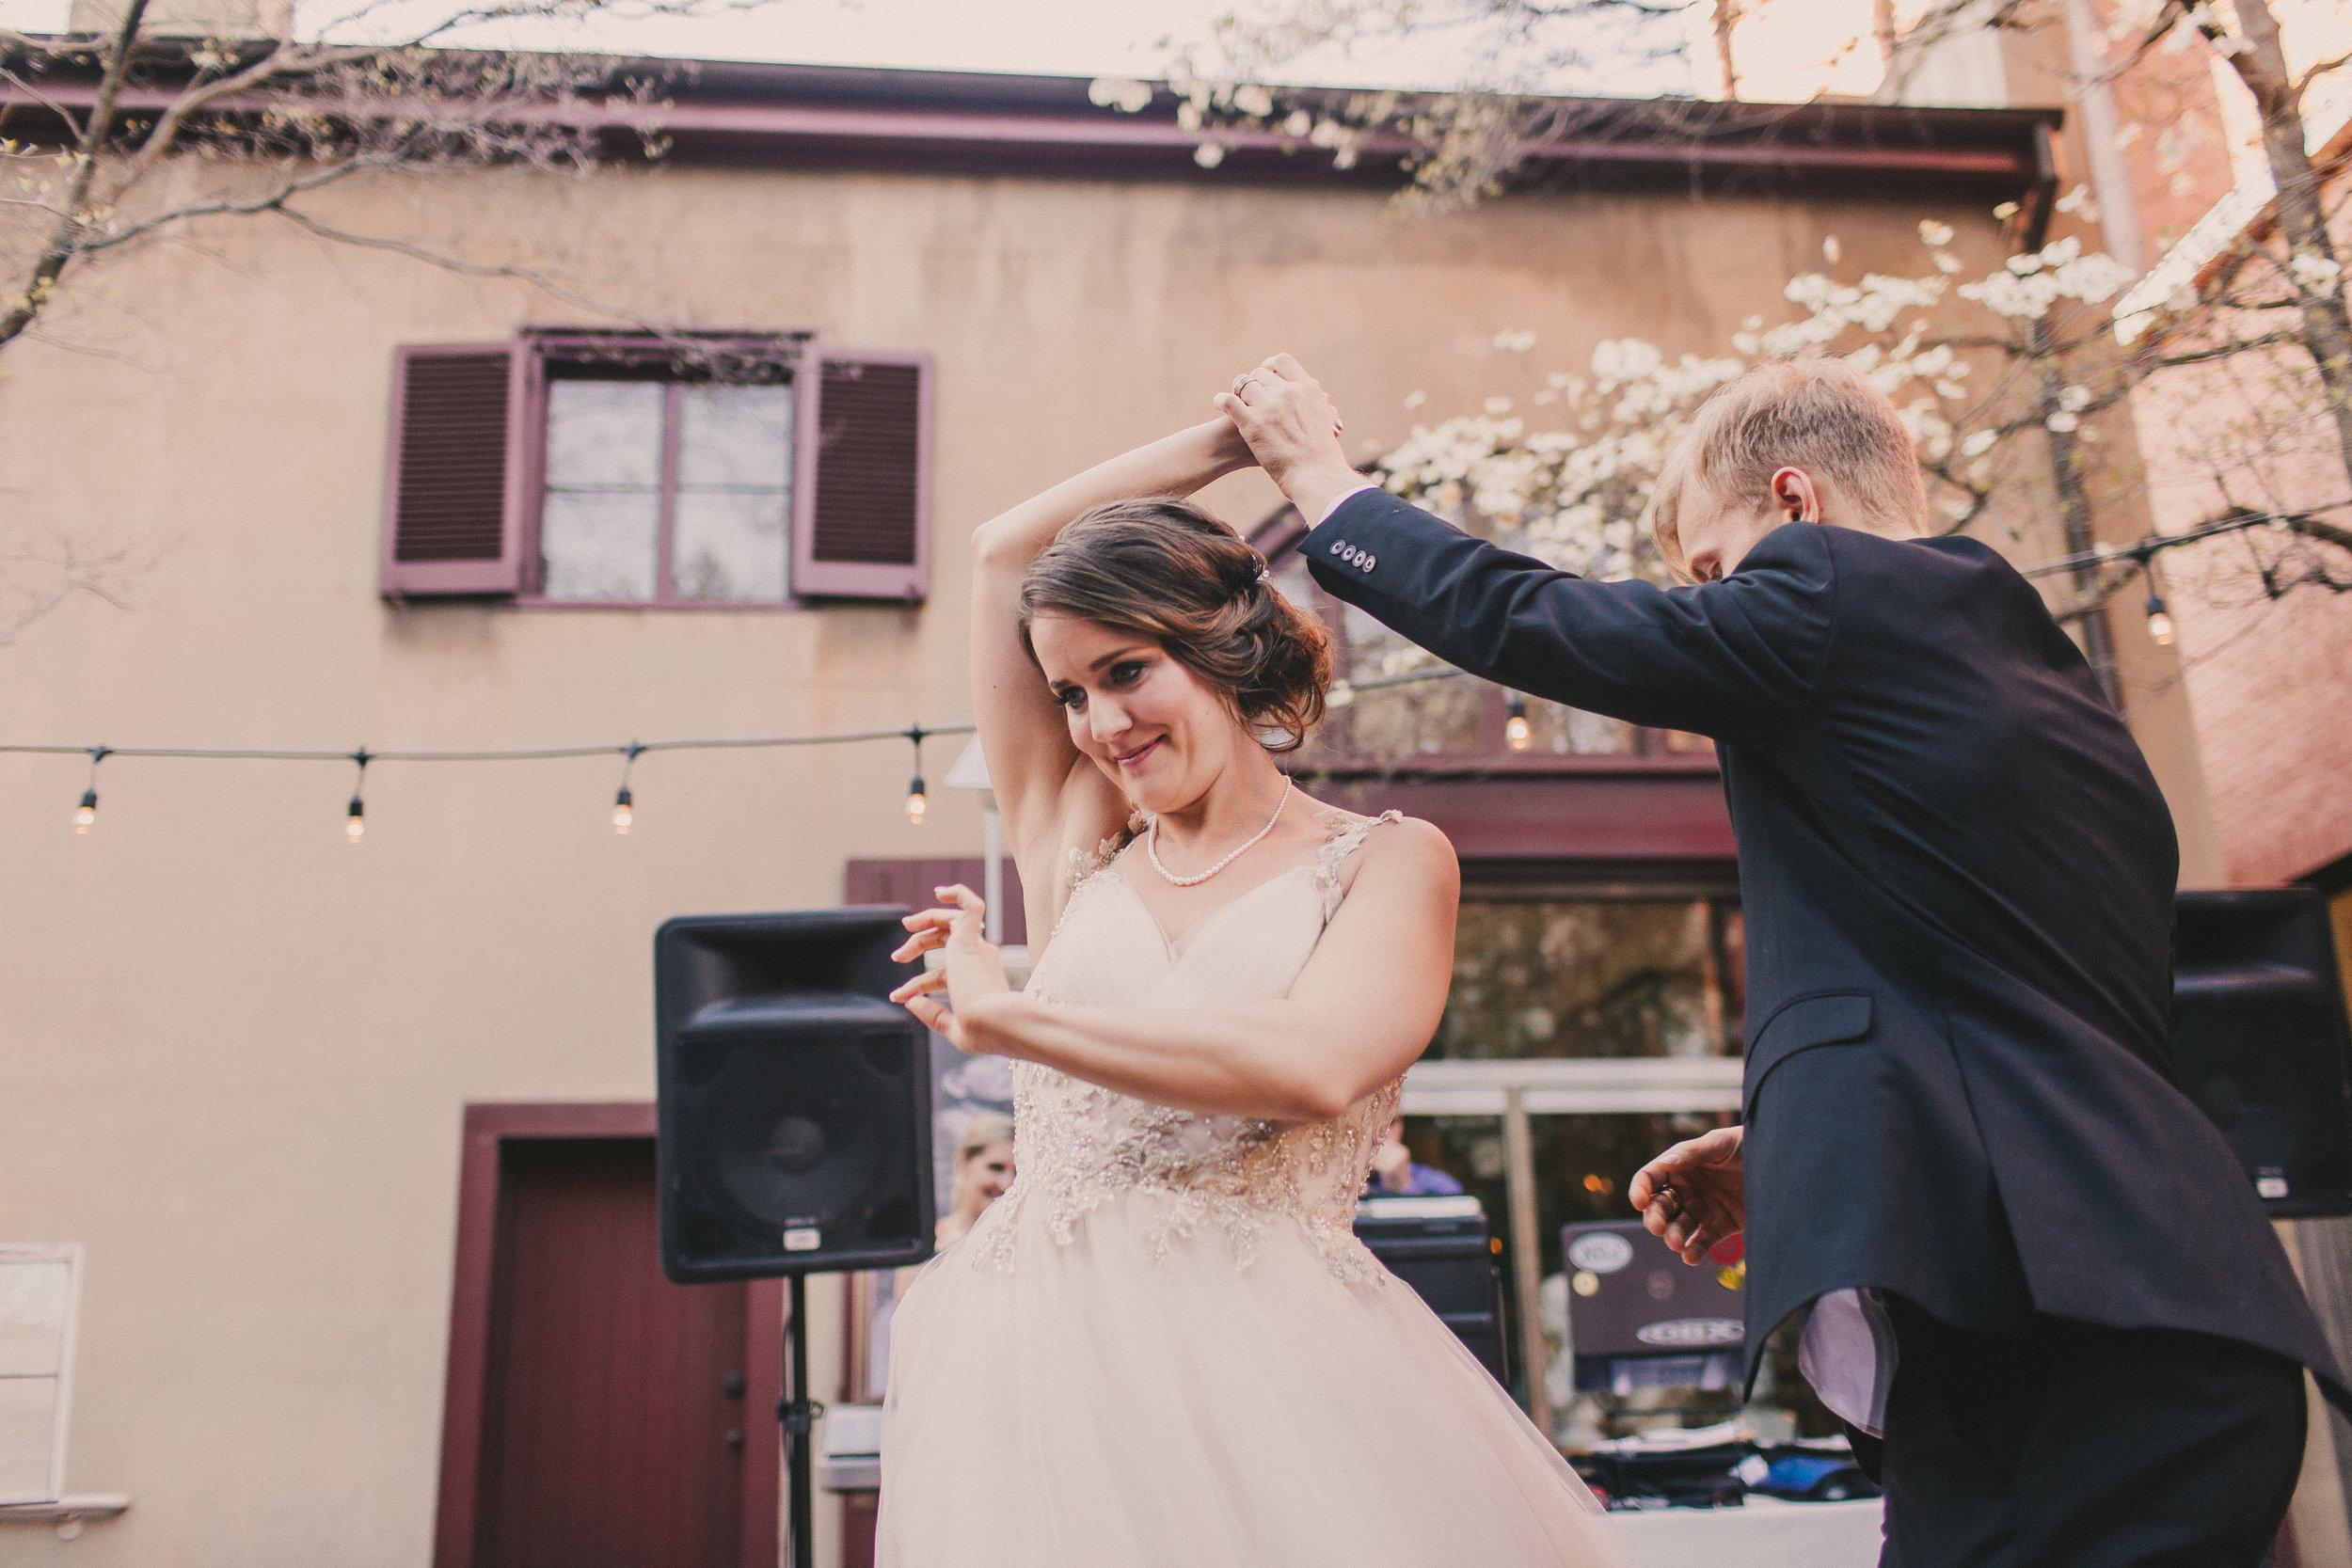 Lindsey & Bert - Wedding 4.1.17-786.jpg